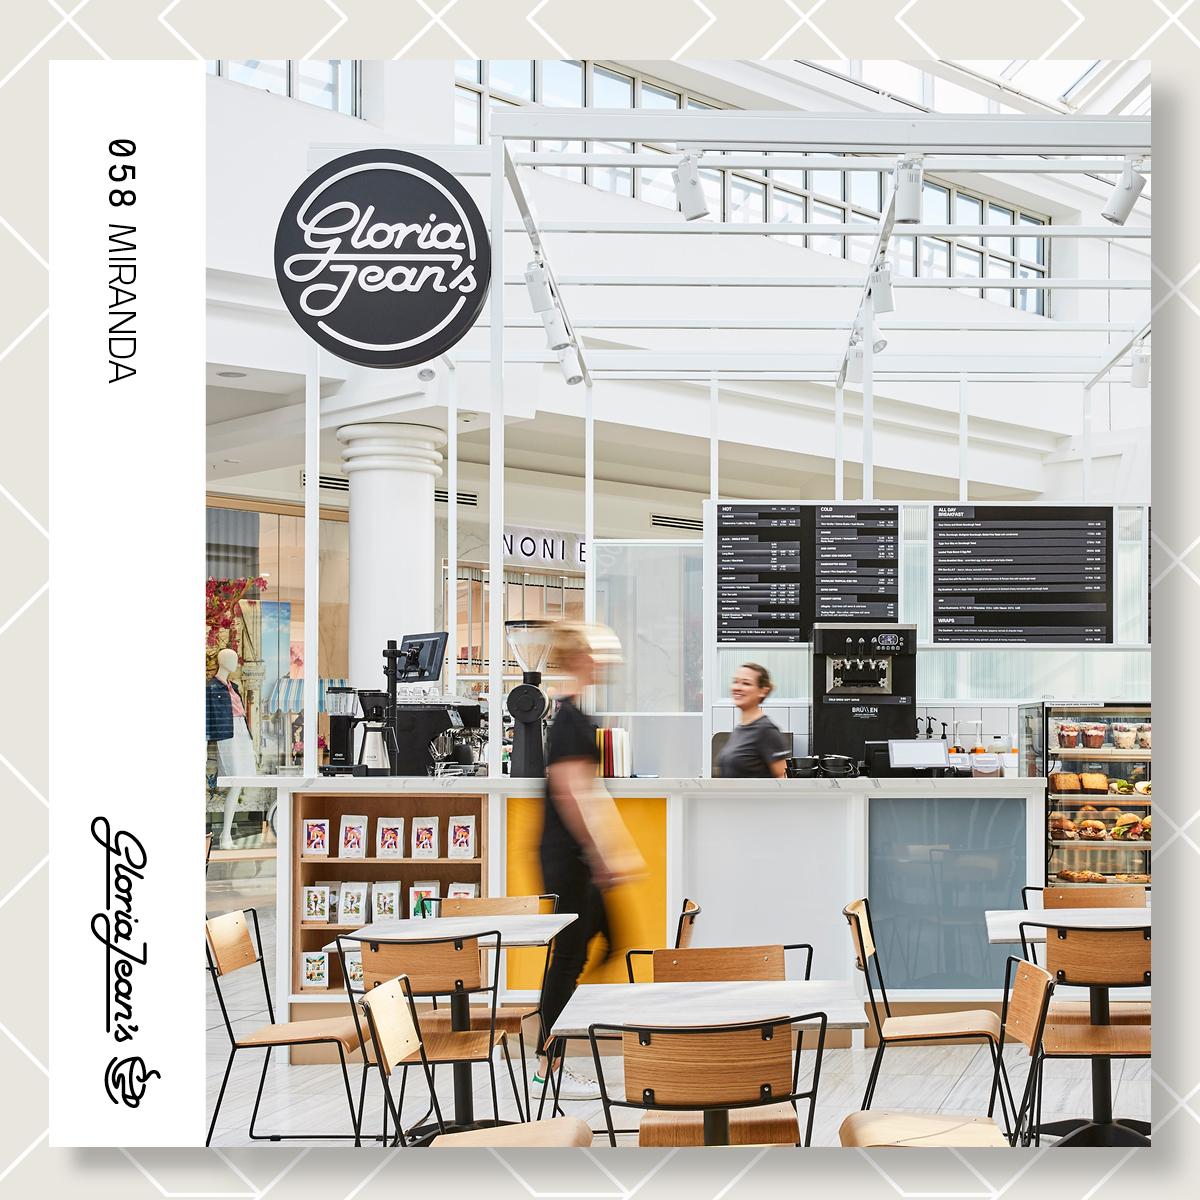 Quality coffee & food for customers on the run. Gloria Jean's Coffees